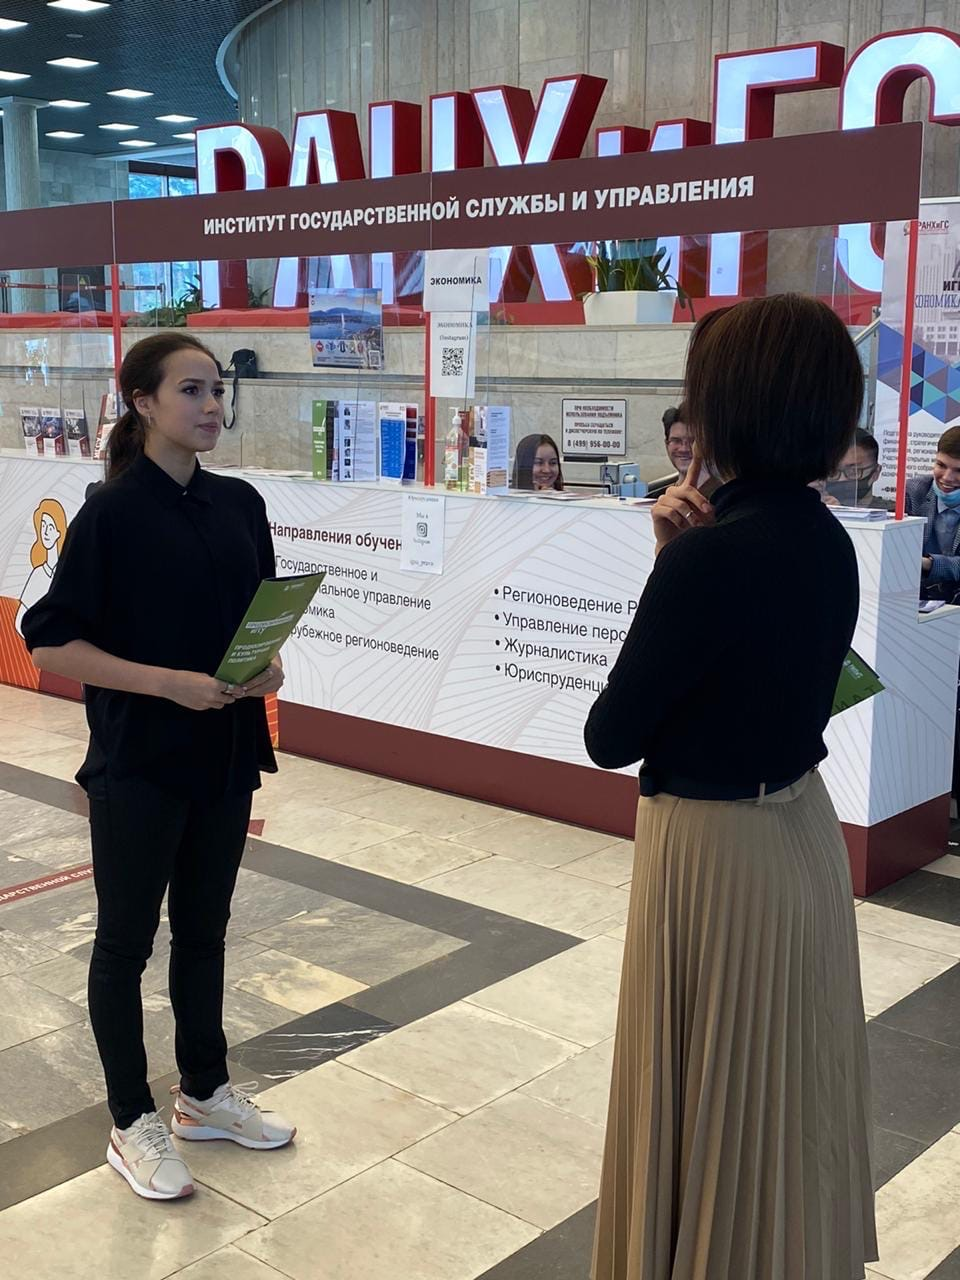 Алина Ильназовна Загитова-3 | Олимпийская чемпионка - Страница 10 Lr-UMNj9yn1-A